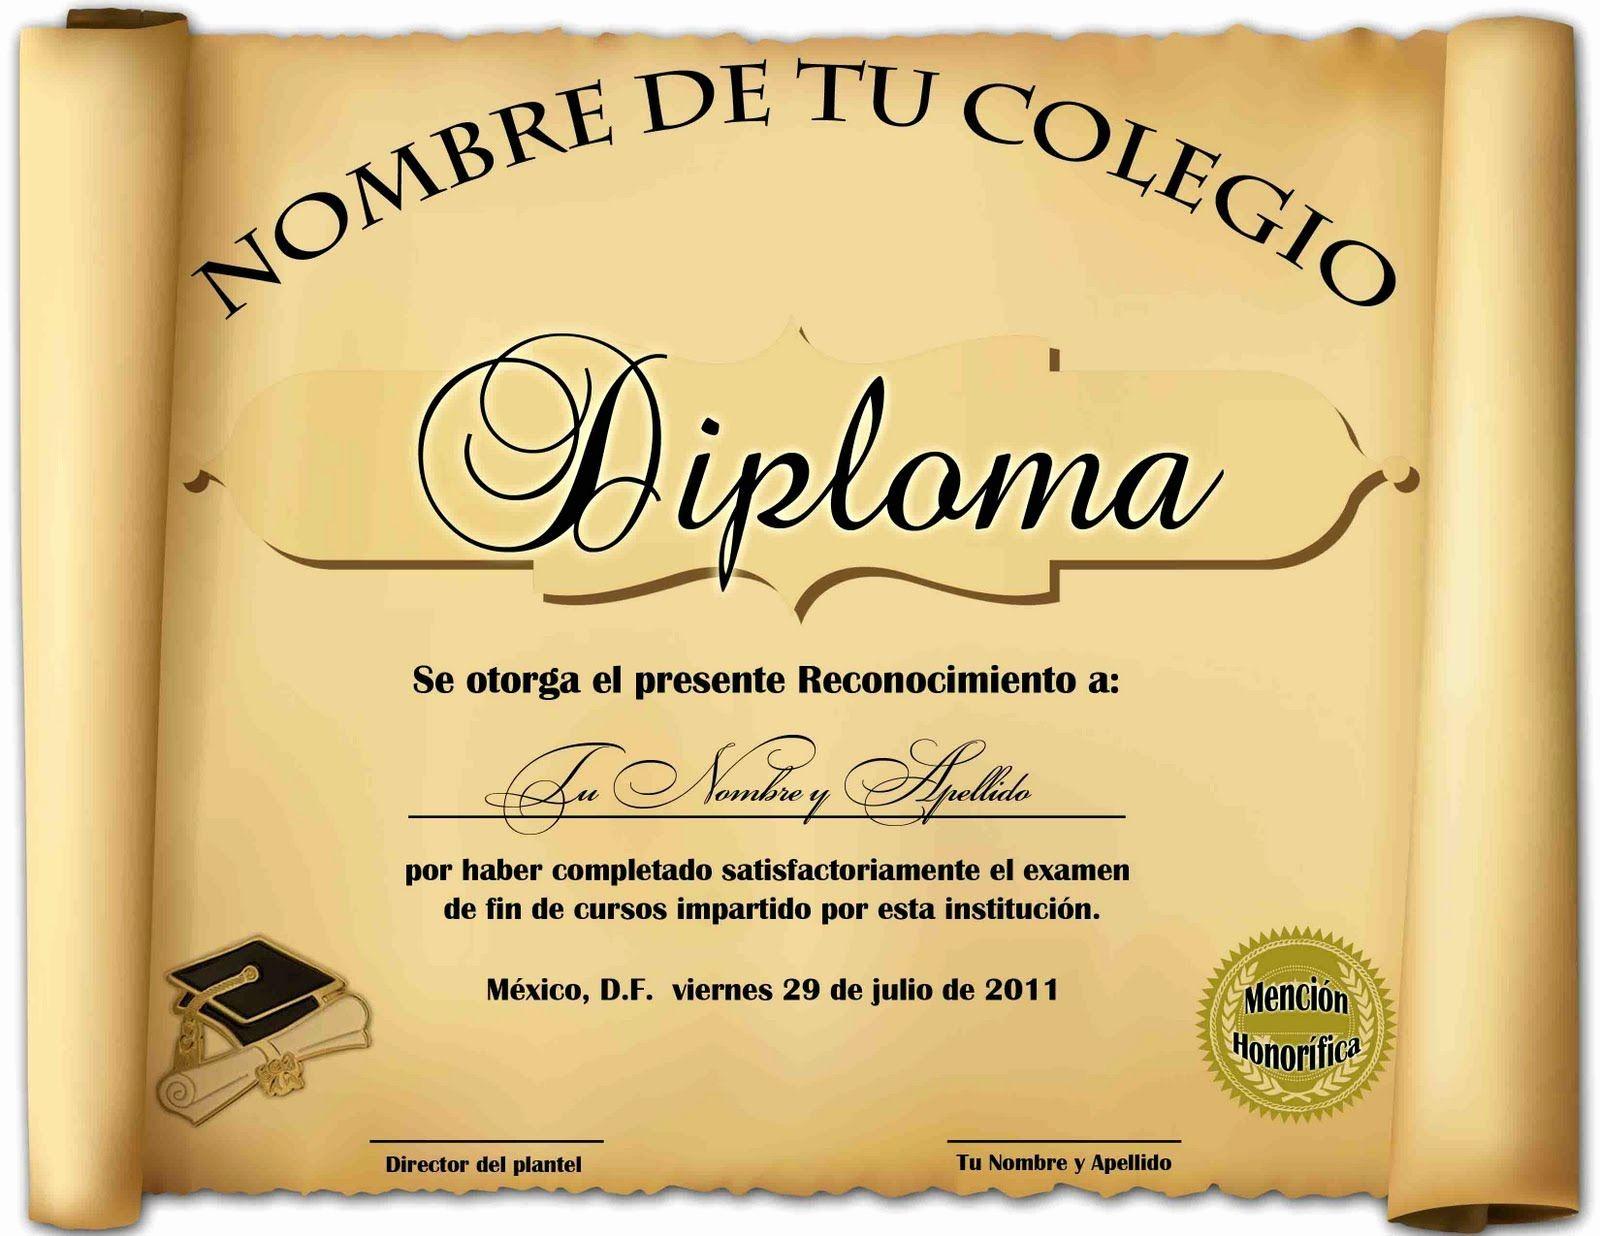 Formatos De Diplomas Para Modificar Awesome Diplomas De Reconocimiento En Blanco Diplomas